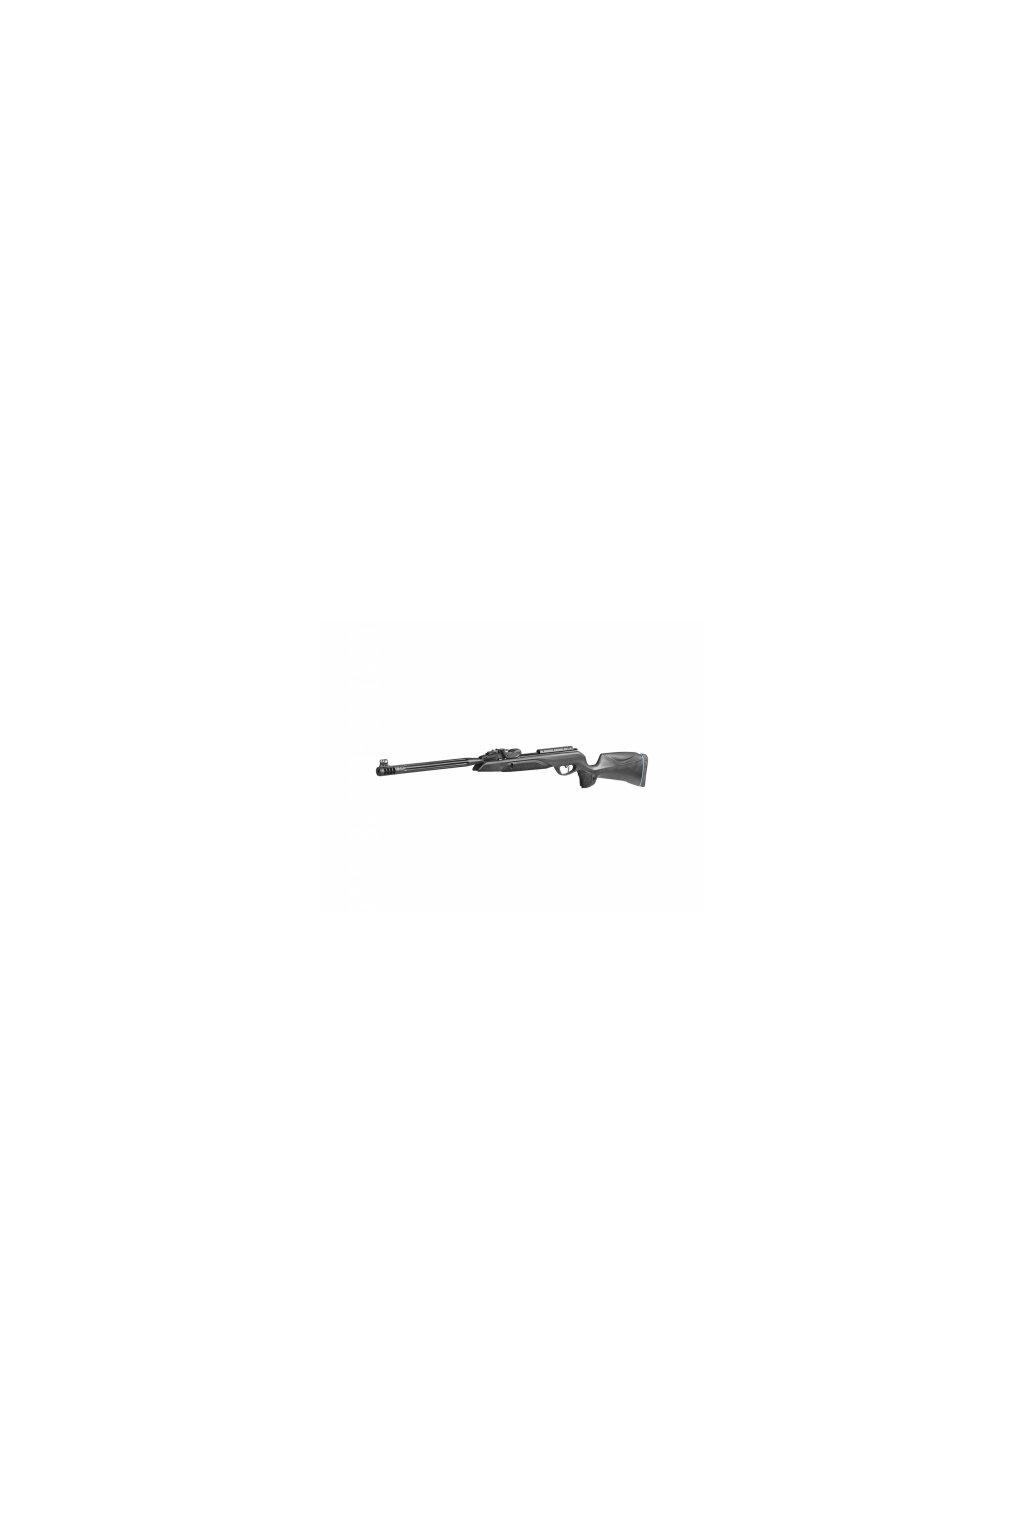 gamo shadow igt 4.5mm air rifle